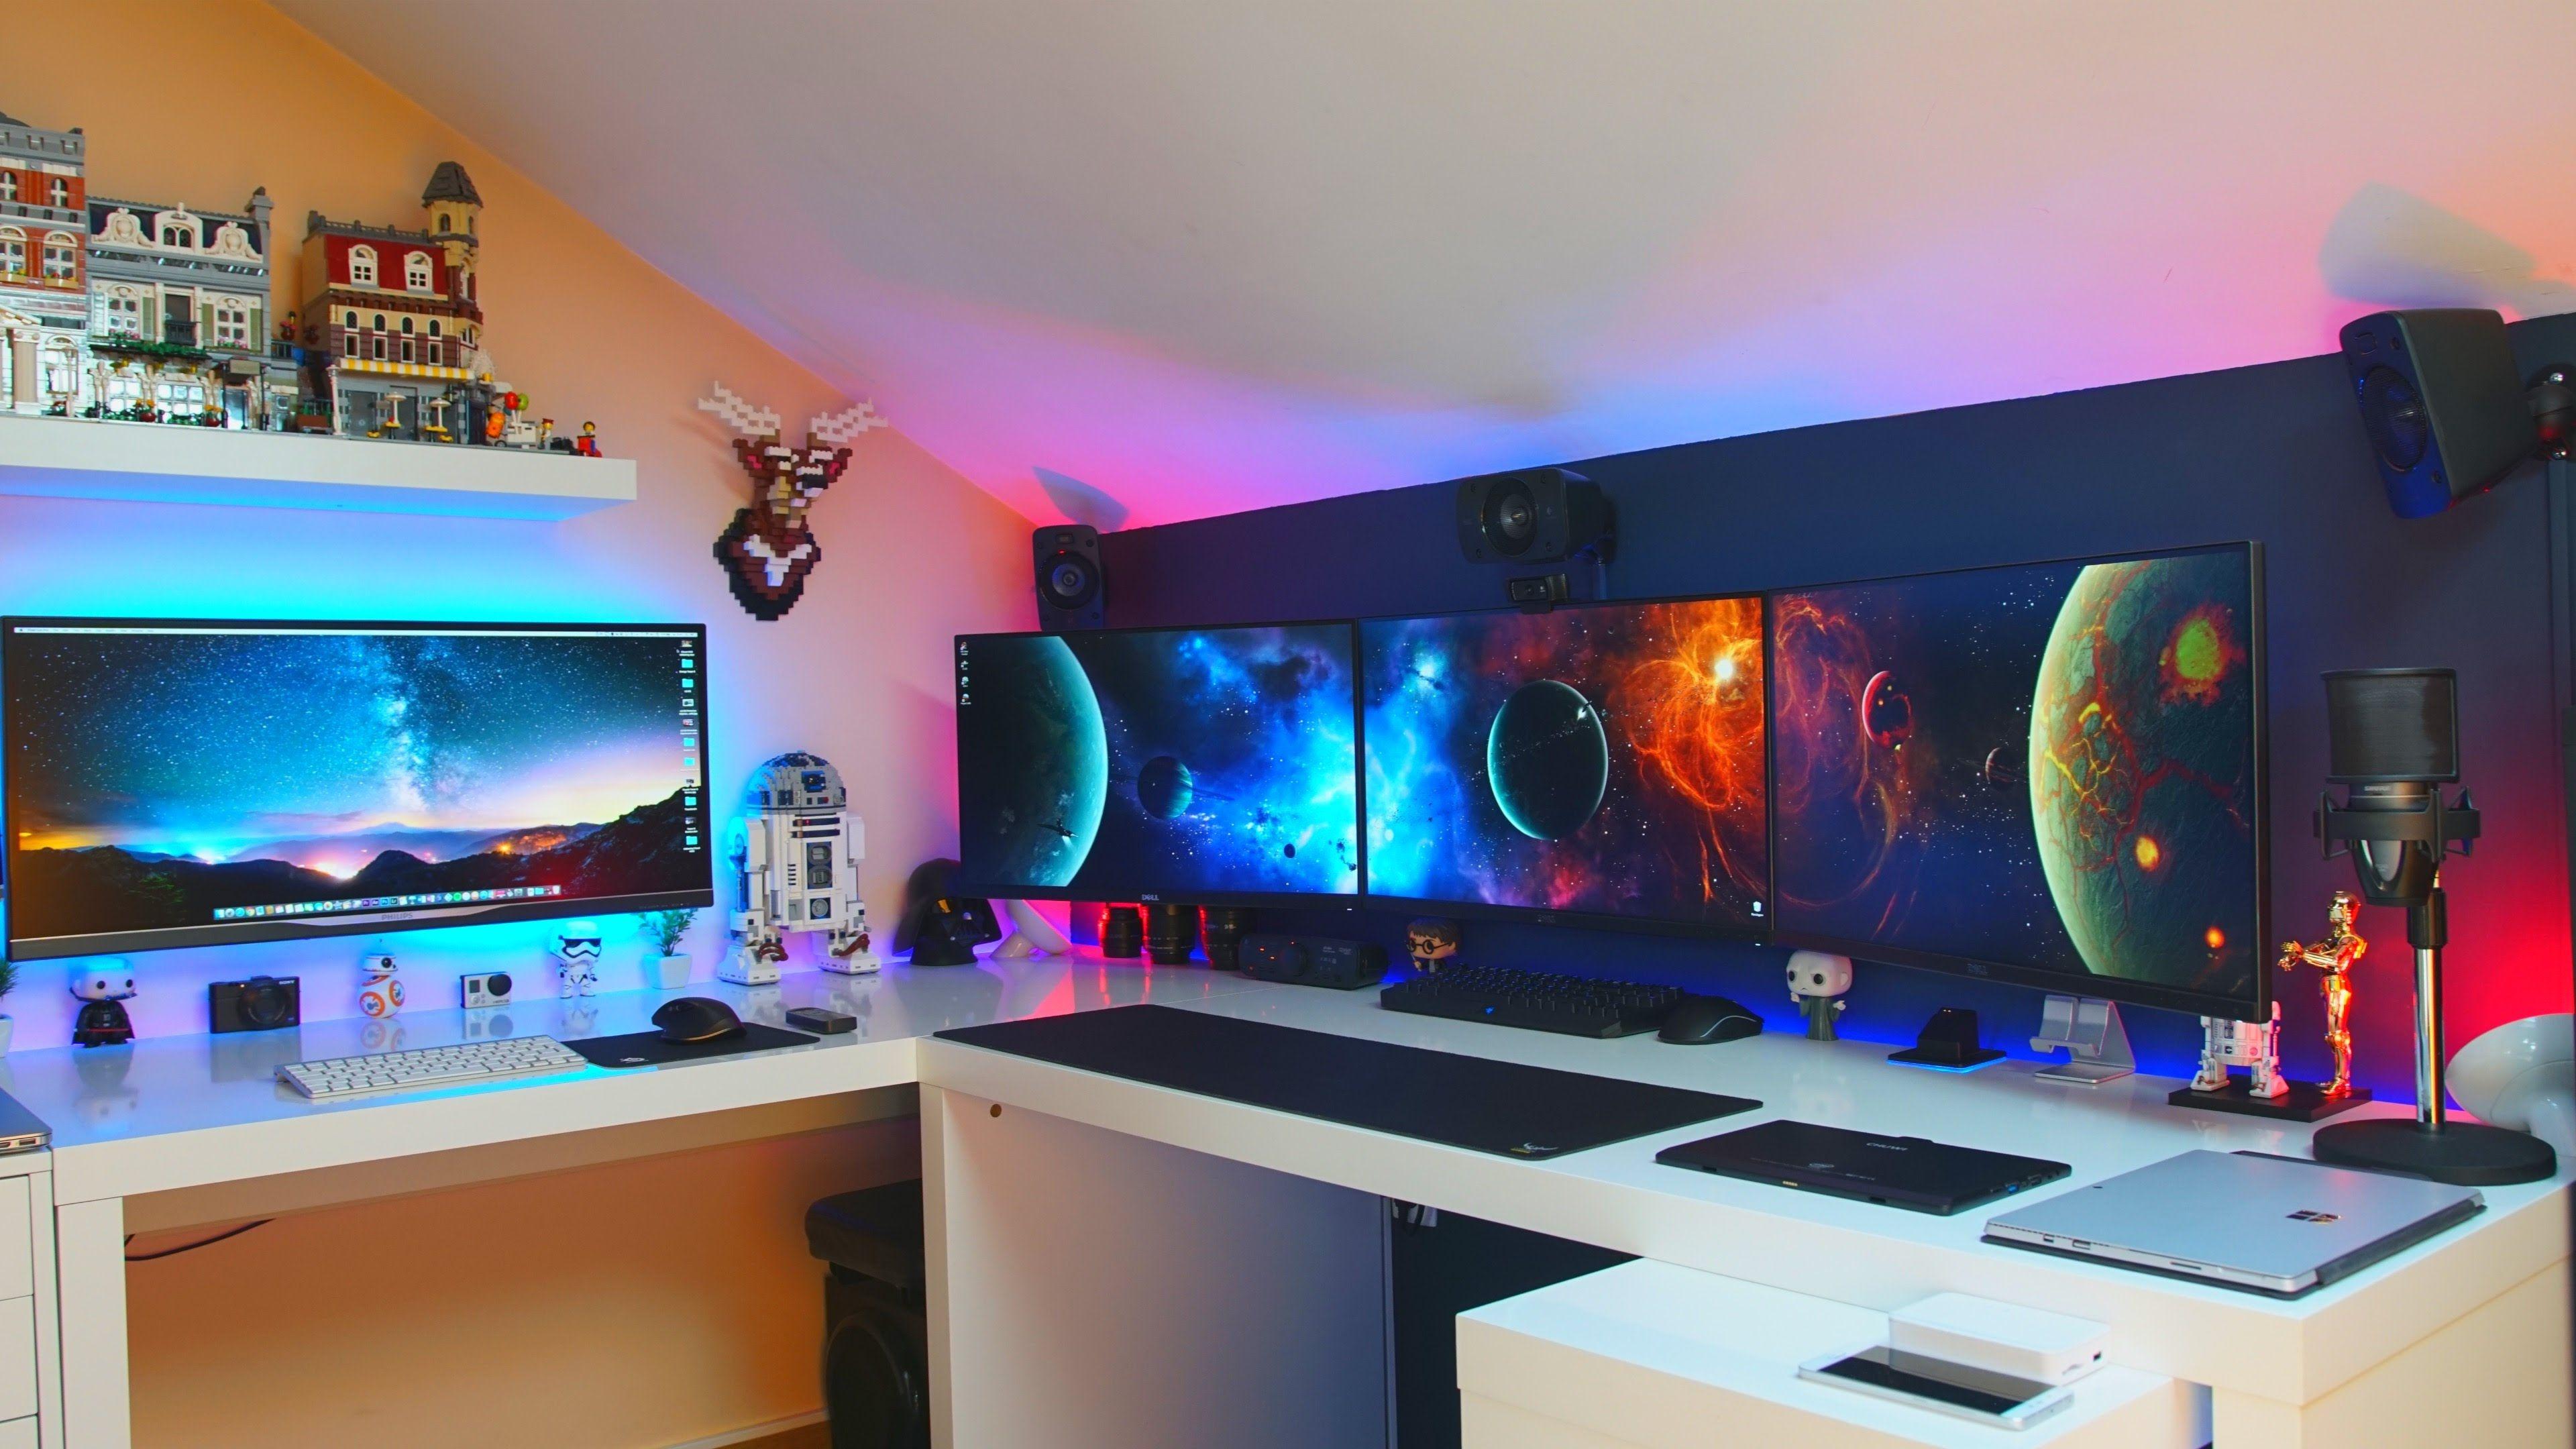 melhor quarto gaming setup tour 2016 portugu s gaming desk in 2018 pinterest. Black Bedroom Furniture Sets. Home Design Ideas